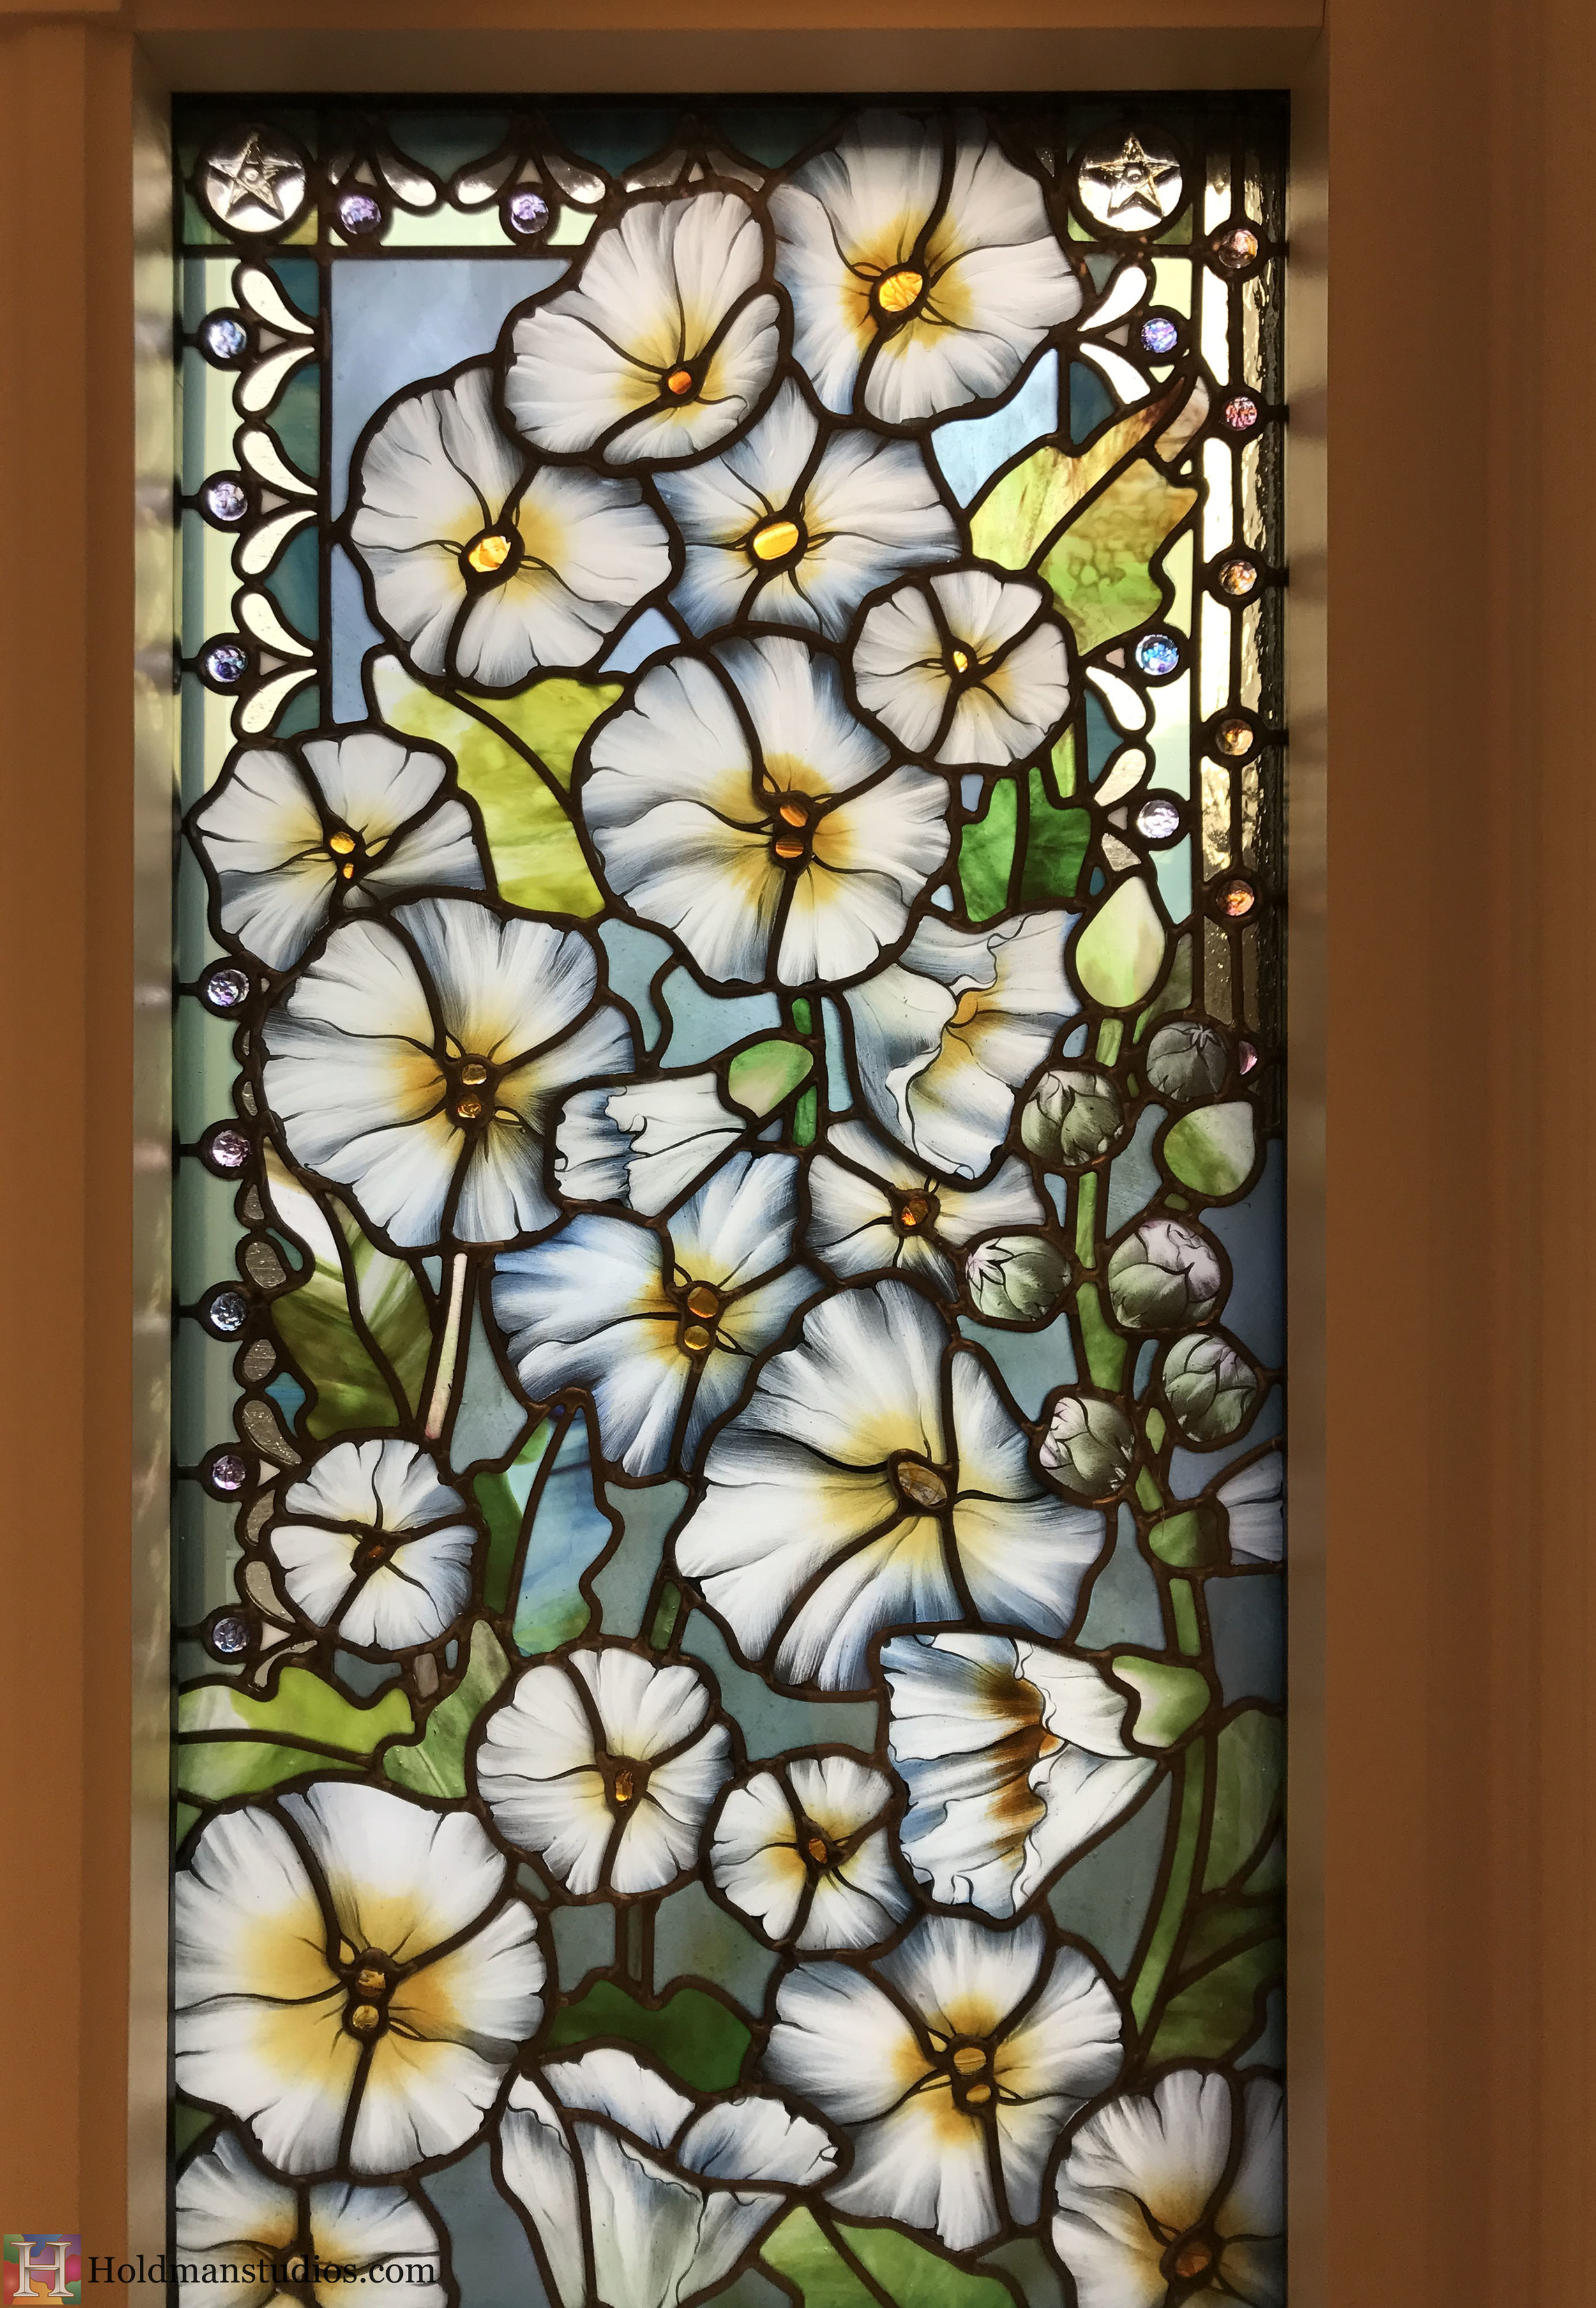 Holdman-Studios-Stained-Glass-Paris-LDS-Temple-Cornflower-Blue-Lily-Flowers-Buds-Leaves-Stars-Closeup-Windows.jpg